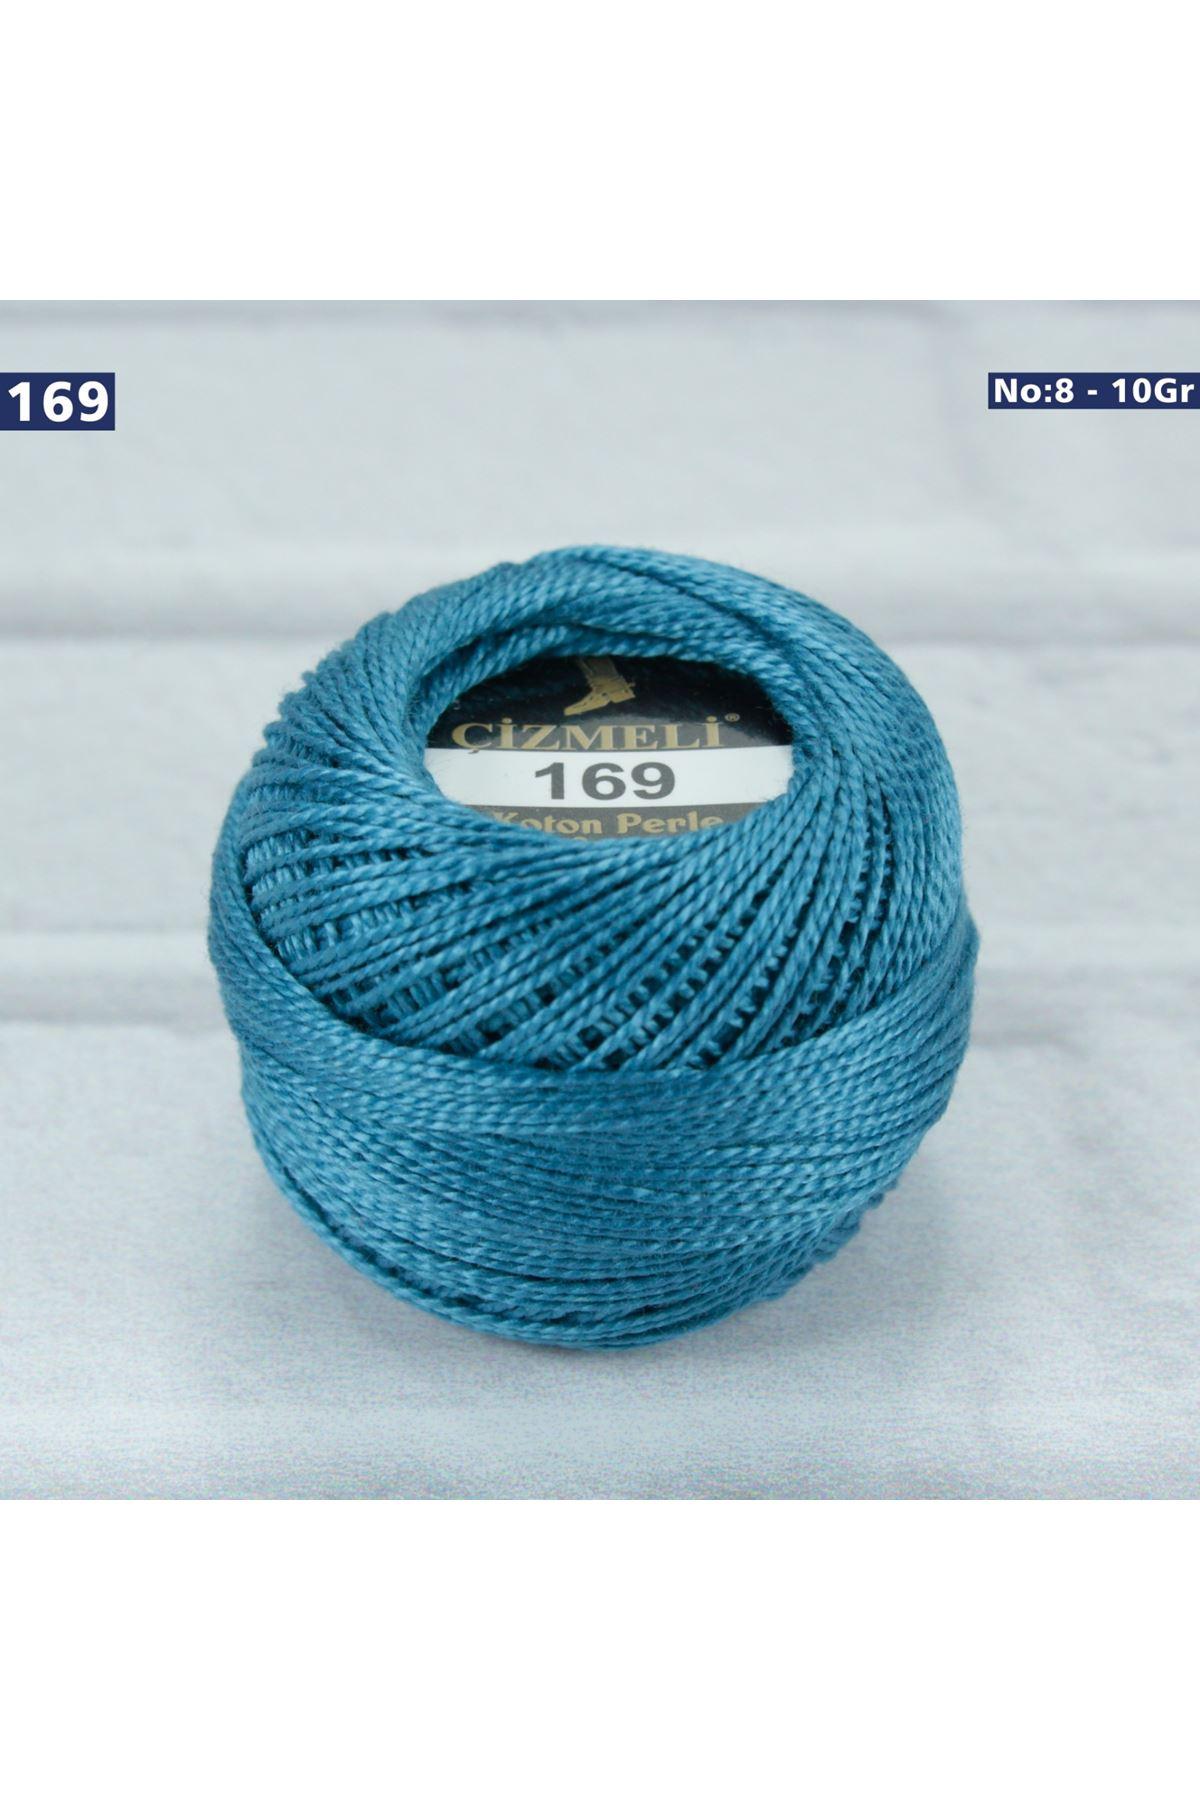 Çizmeli Cotton Perle Nakış İpliği No: 169